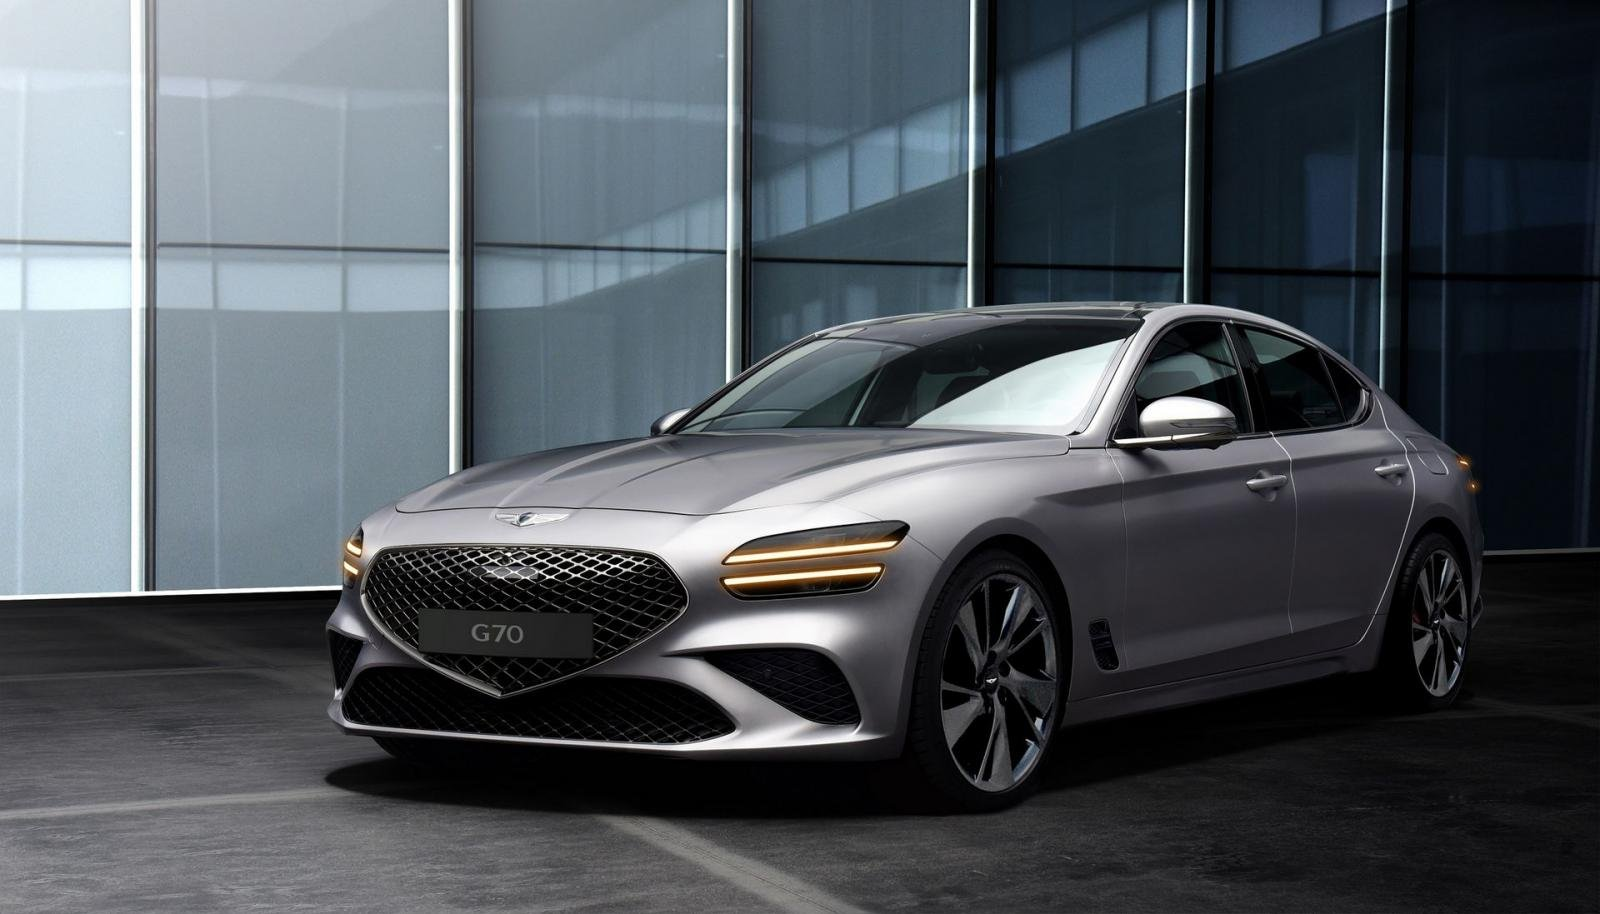 Genesis G70 2022 facelift lộ diện sớm